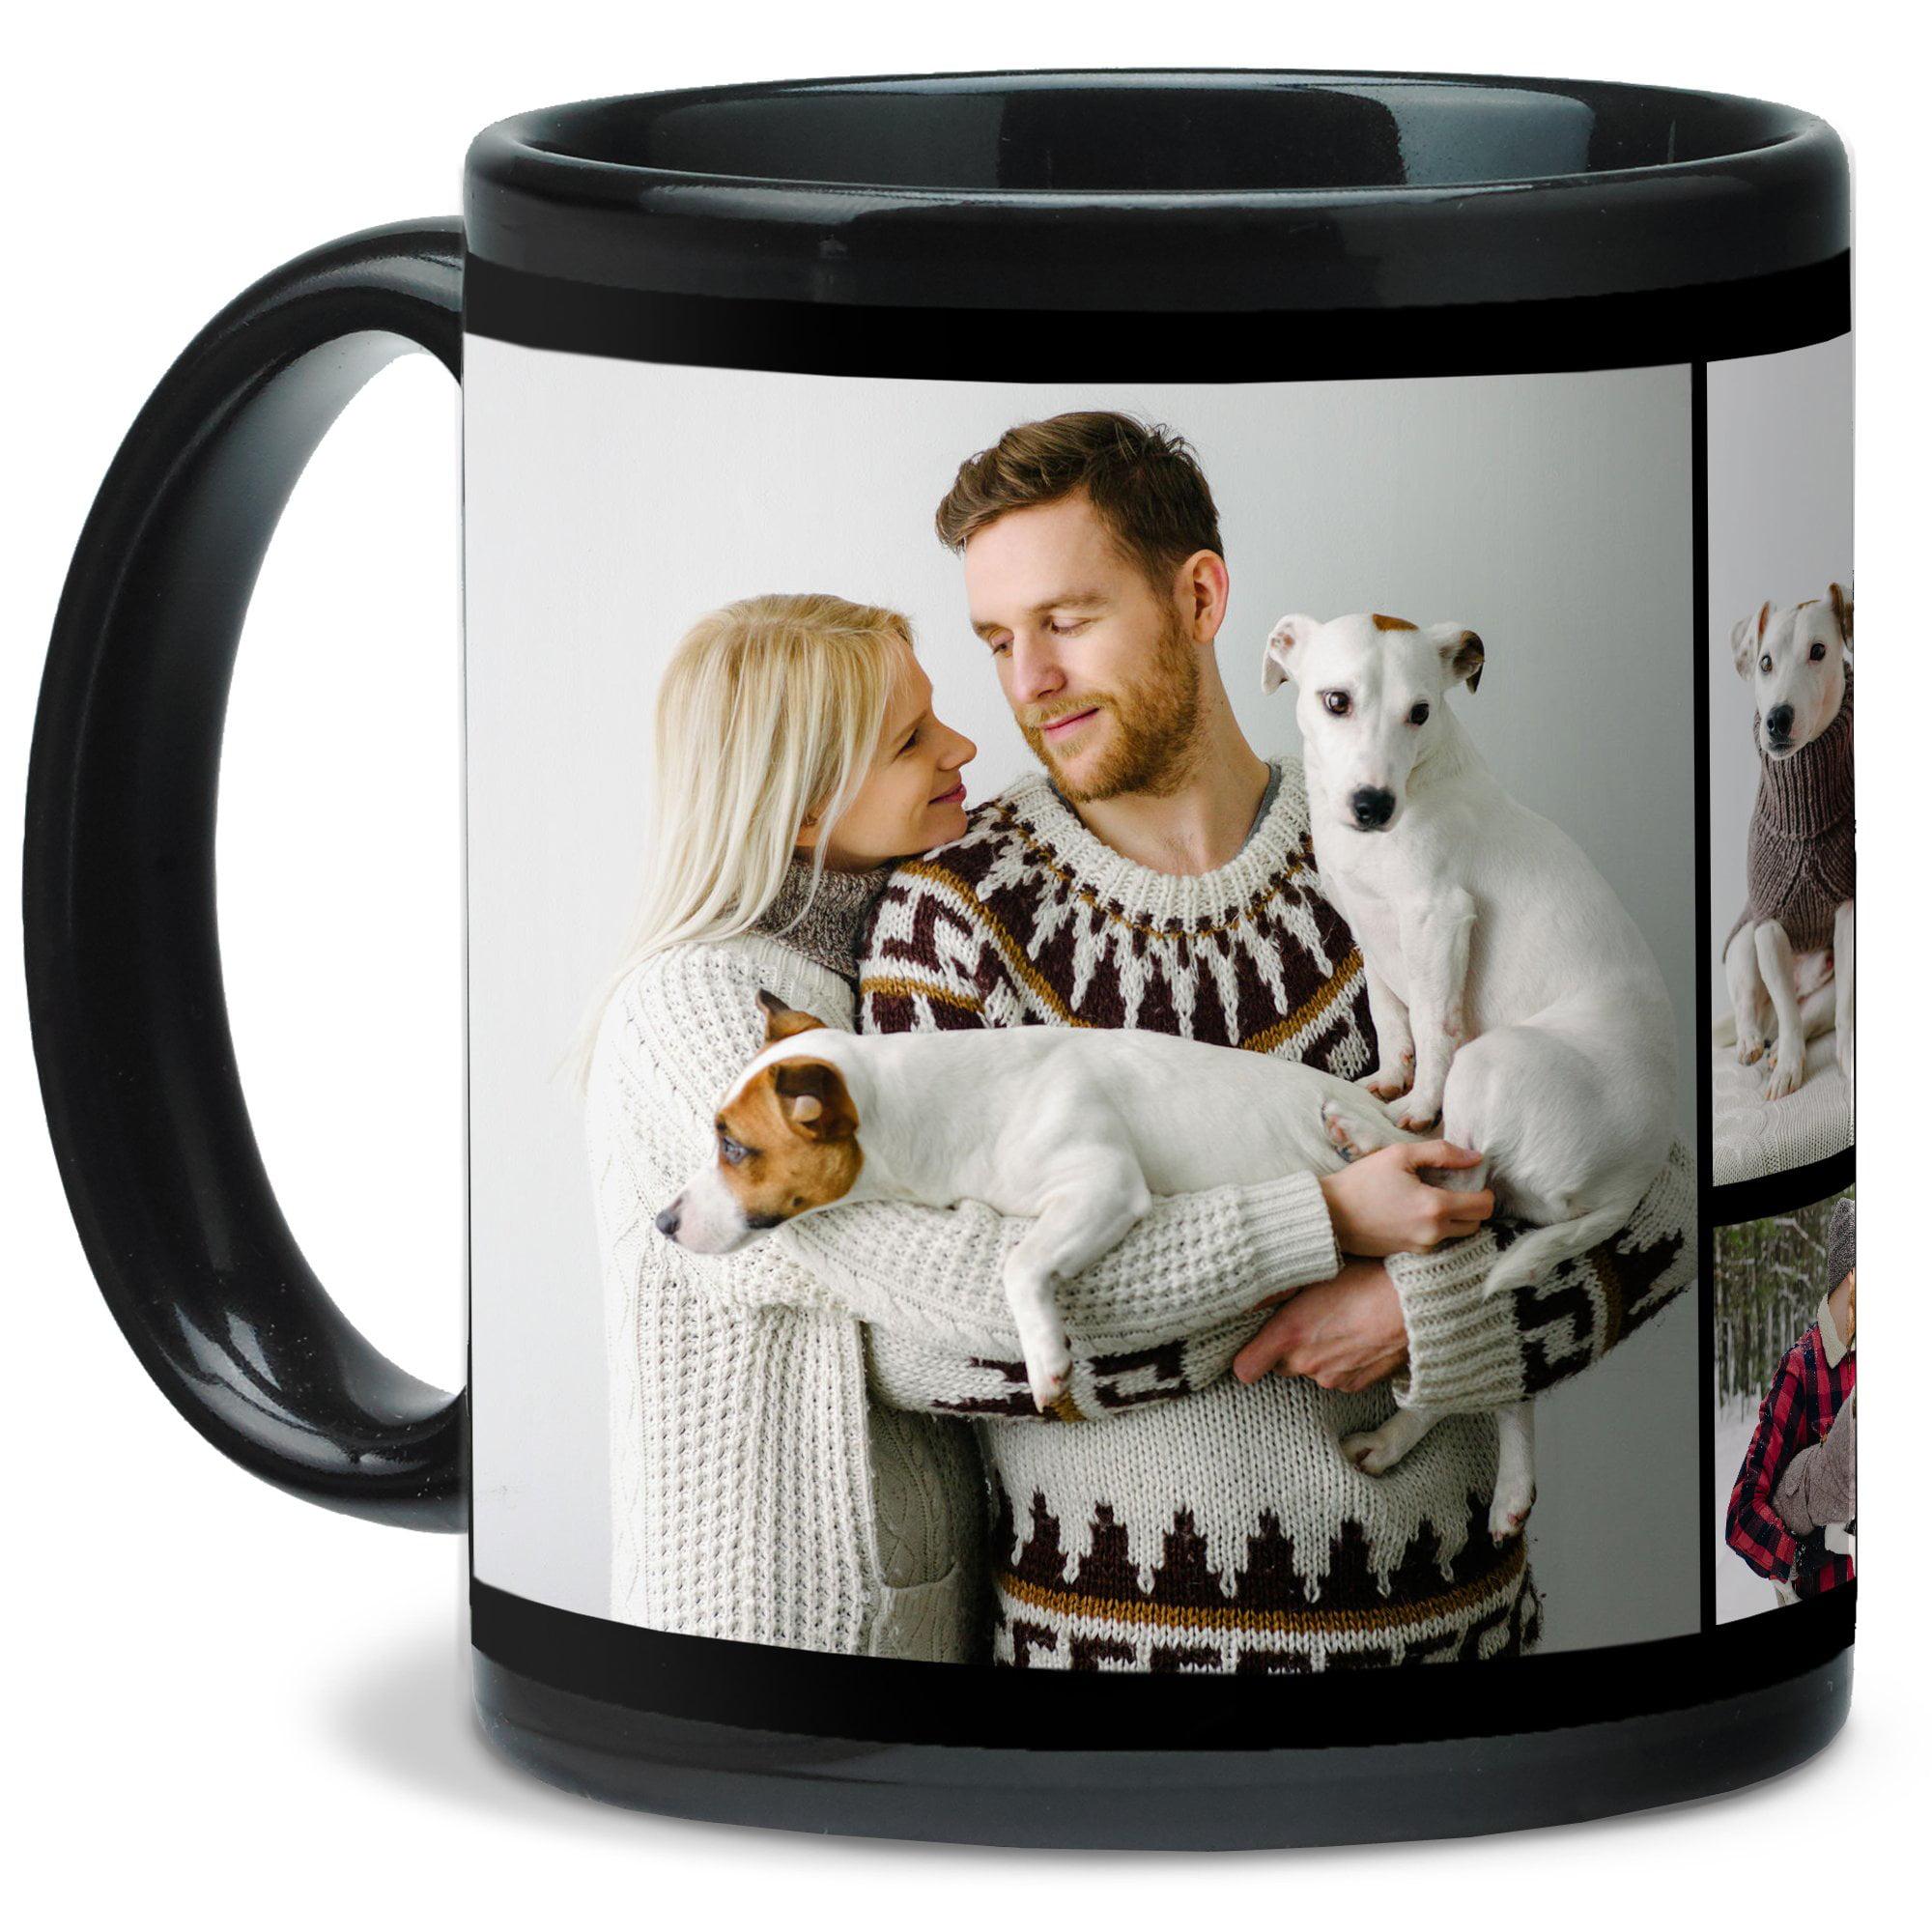 Black Collage Mug 11 oz